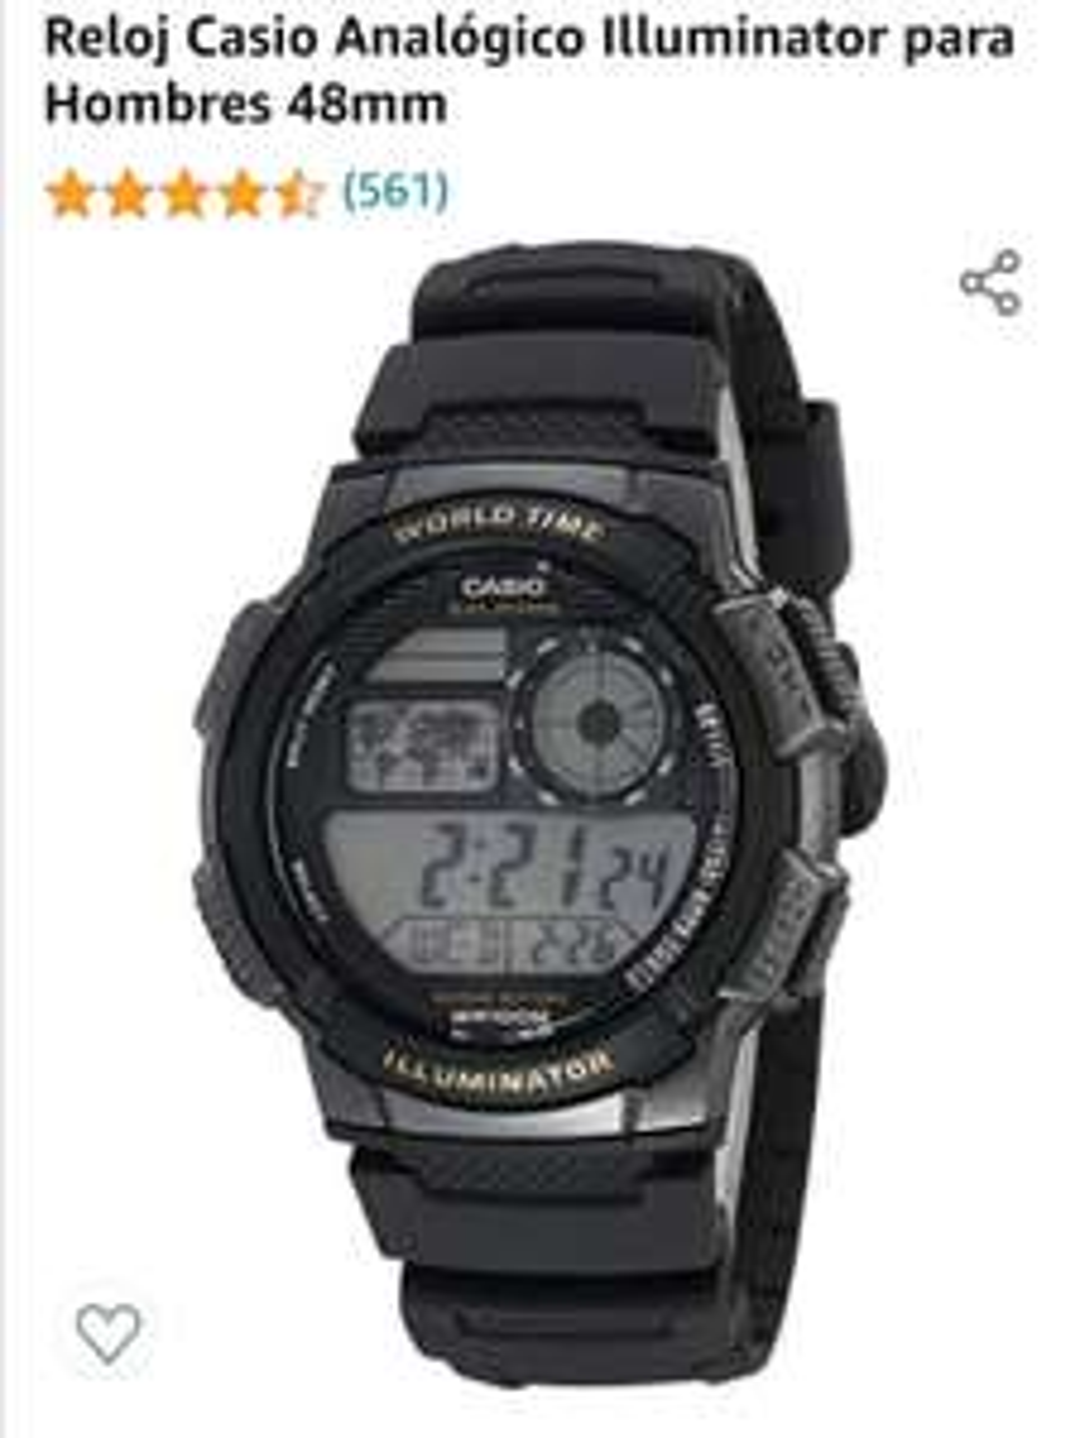 Amazon Reloj Casio Analógico Illuminator para Hombres 48mm